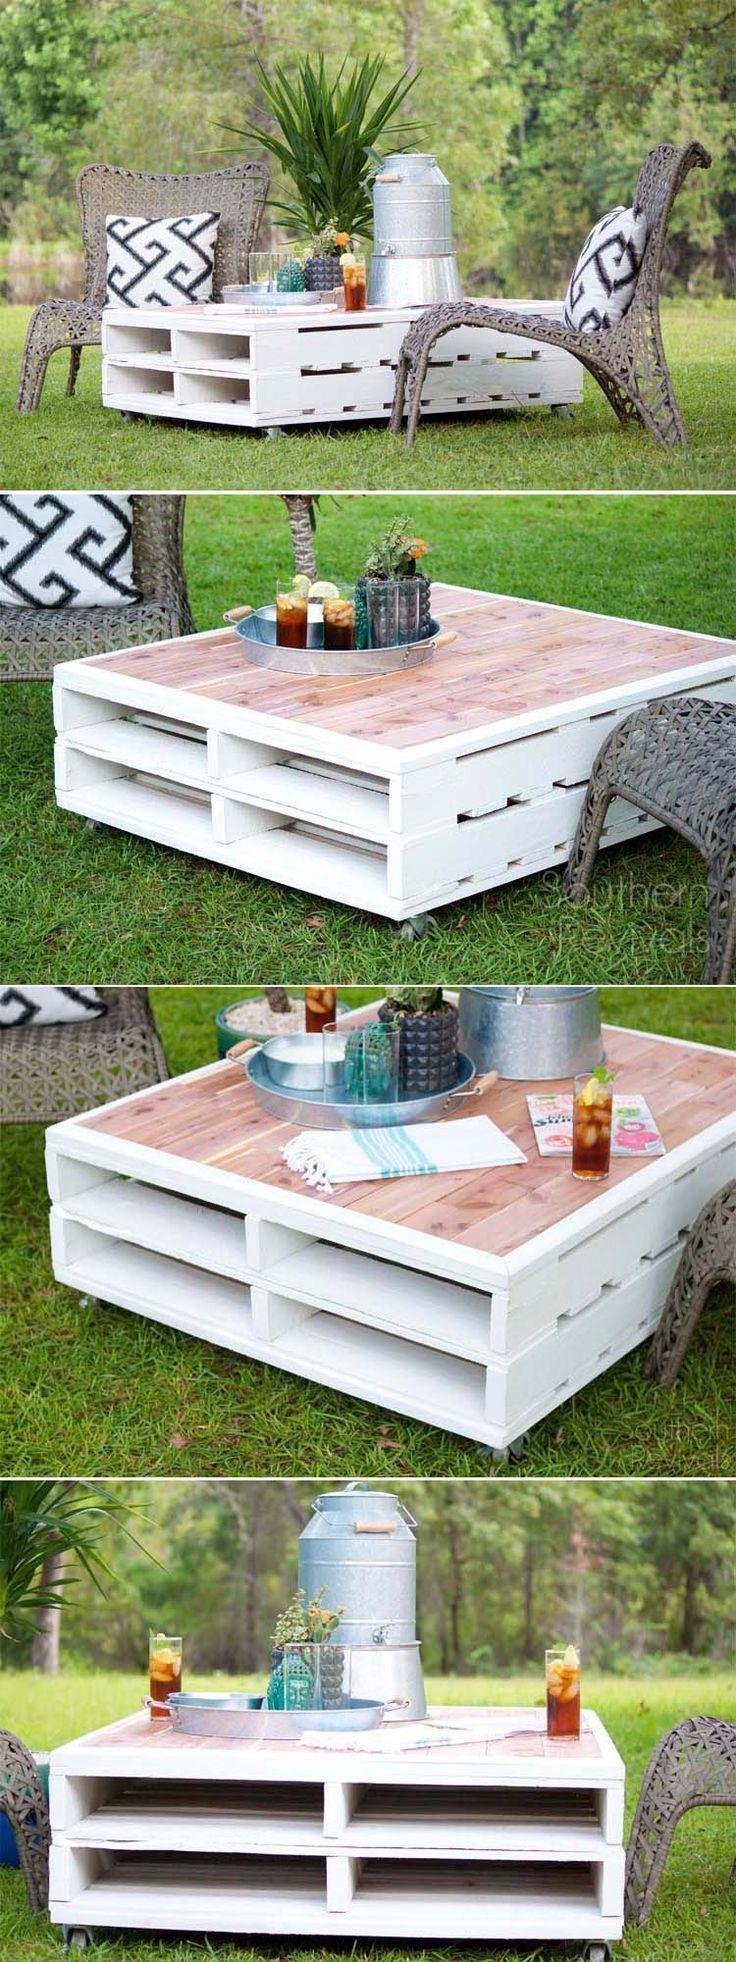 DIY Outdoor Pallet Coffee Table cheap home decor ideas rustic